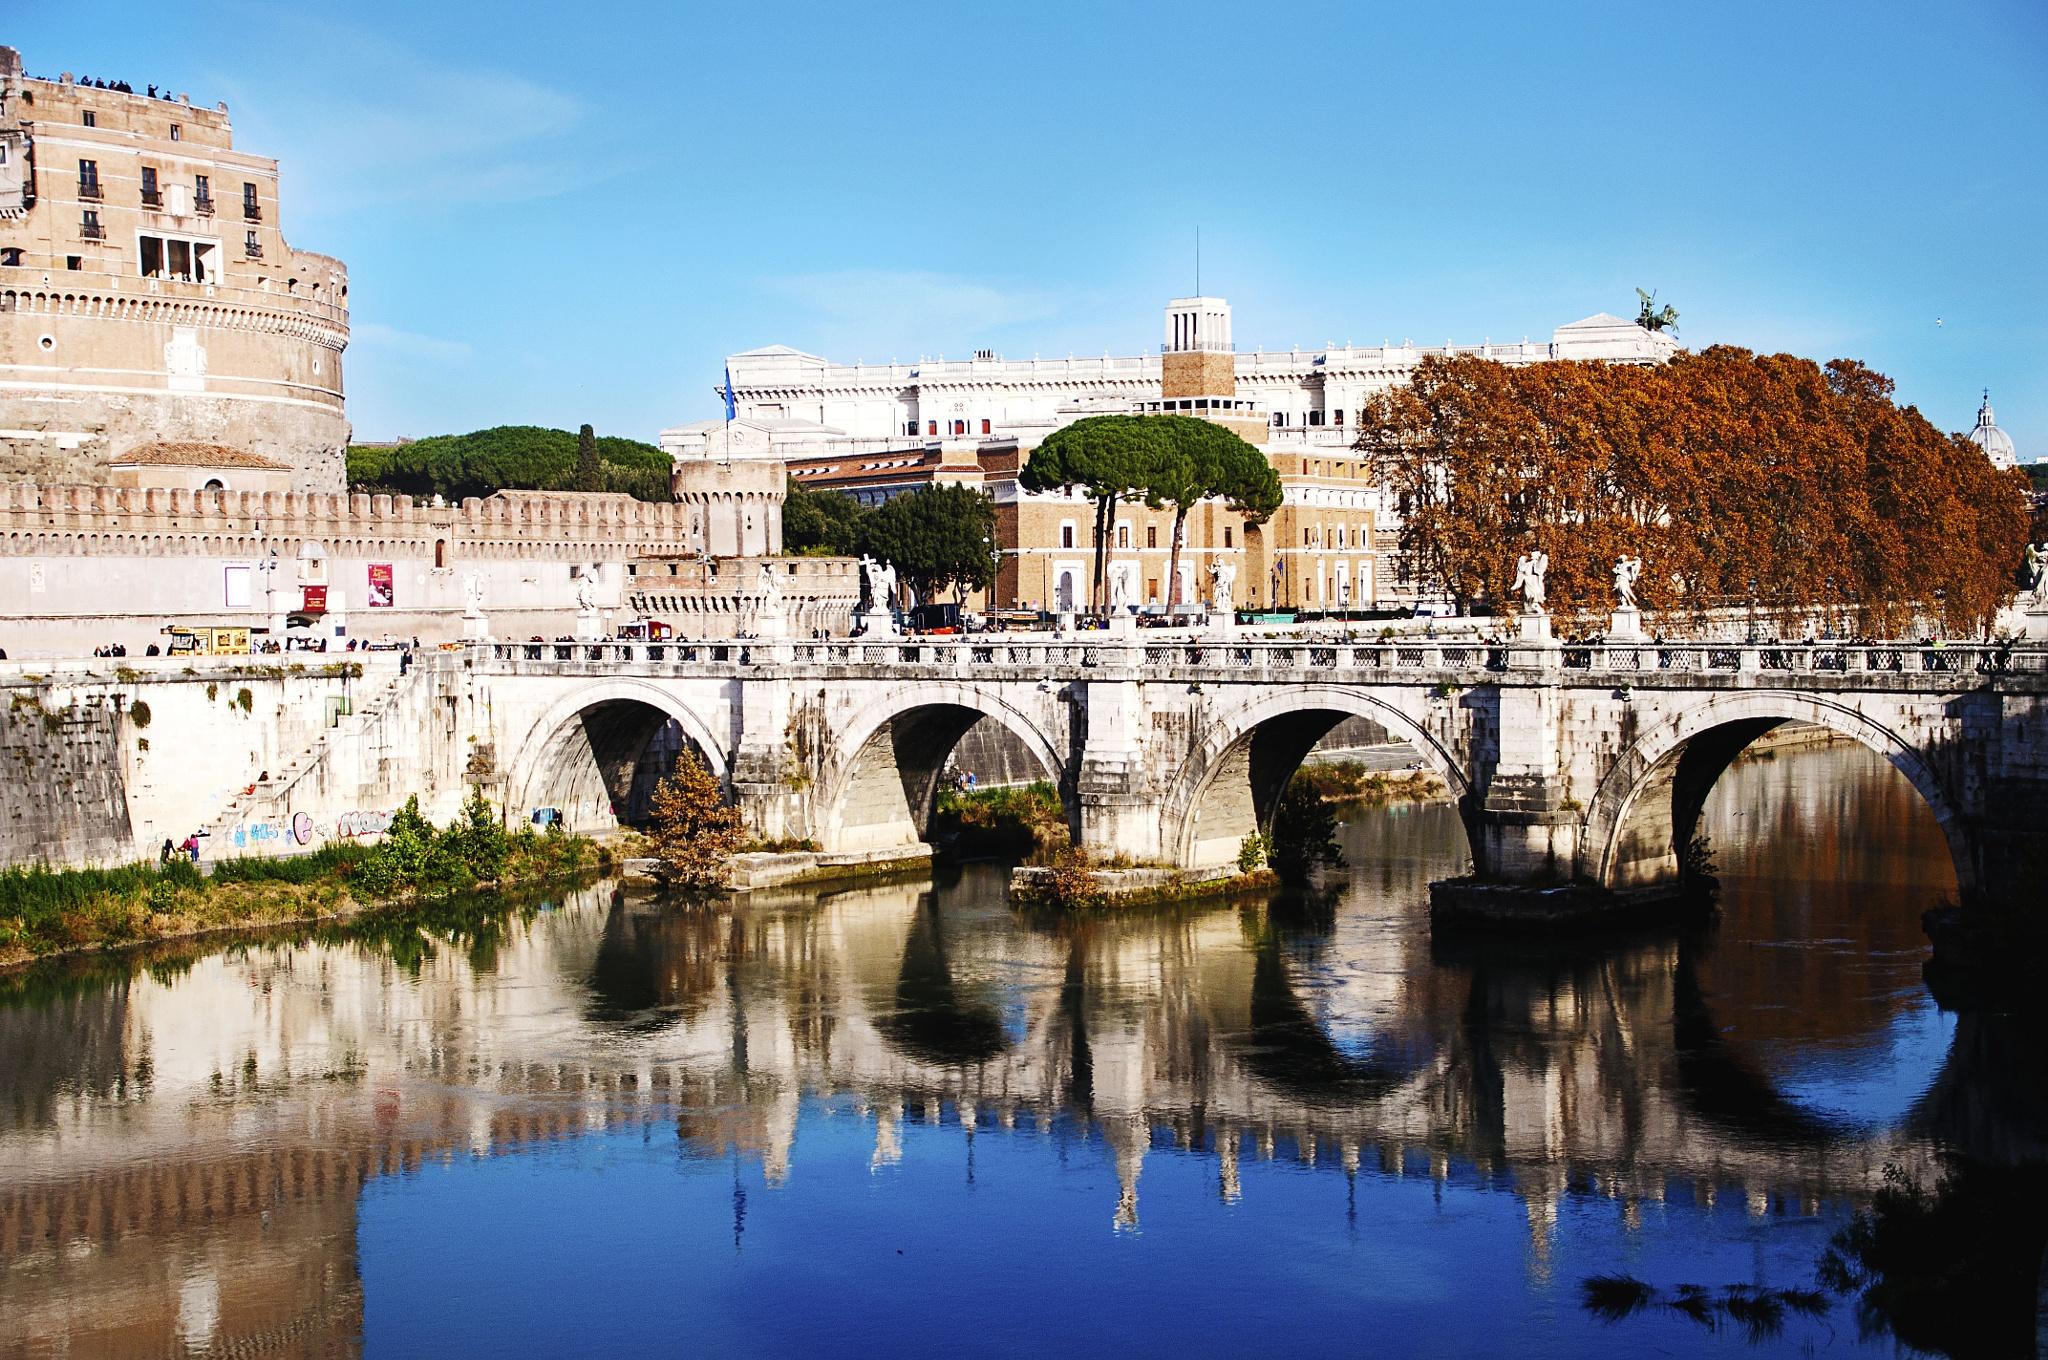 Tiber River by Jacqueline Rose